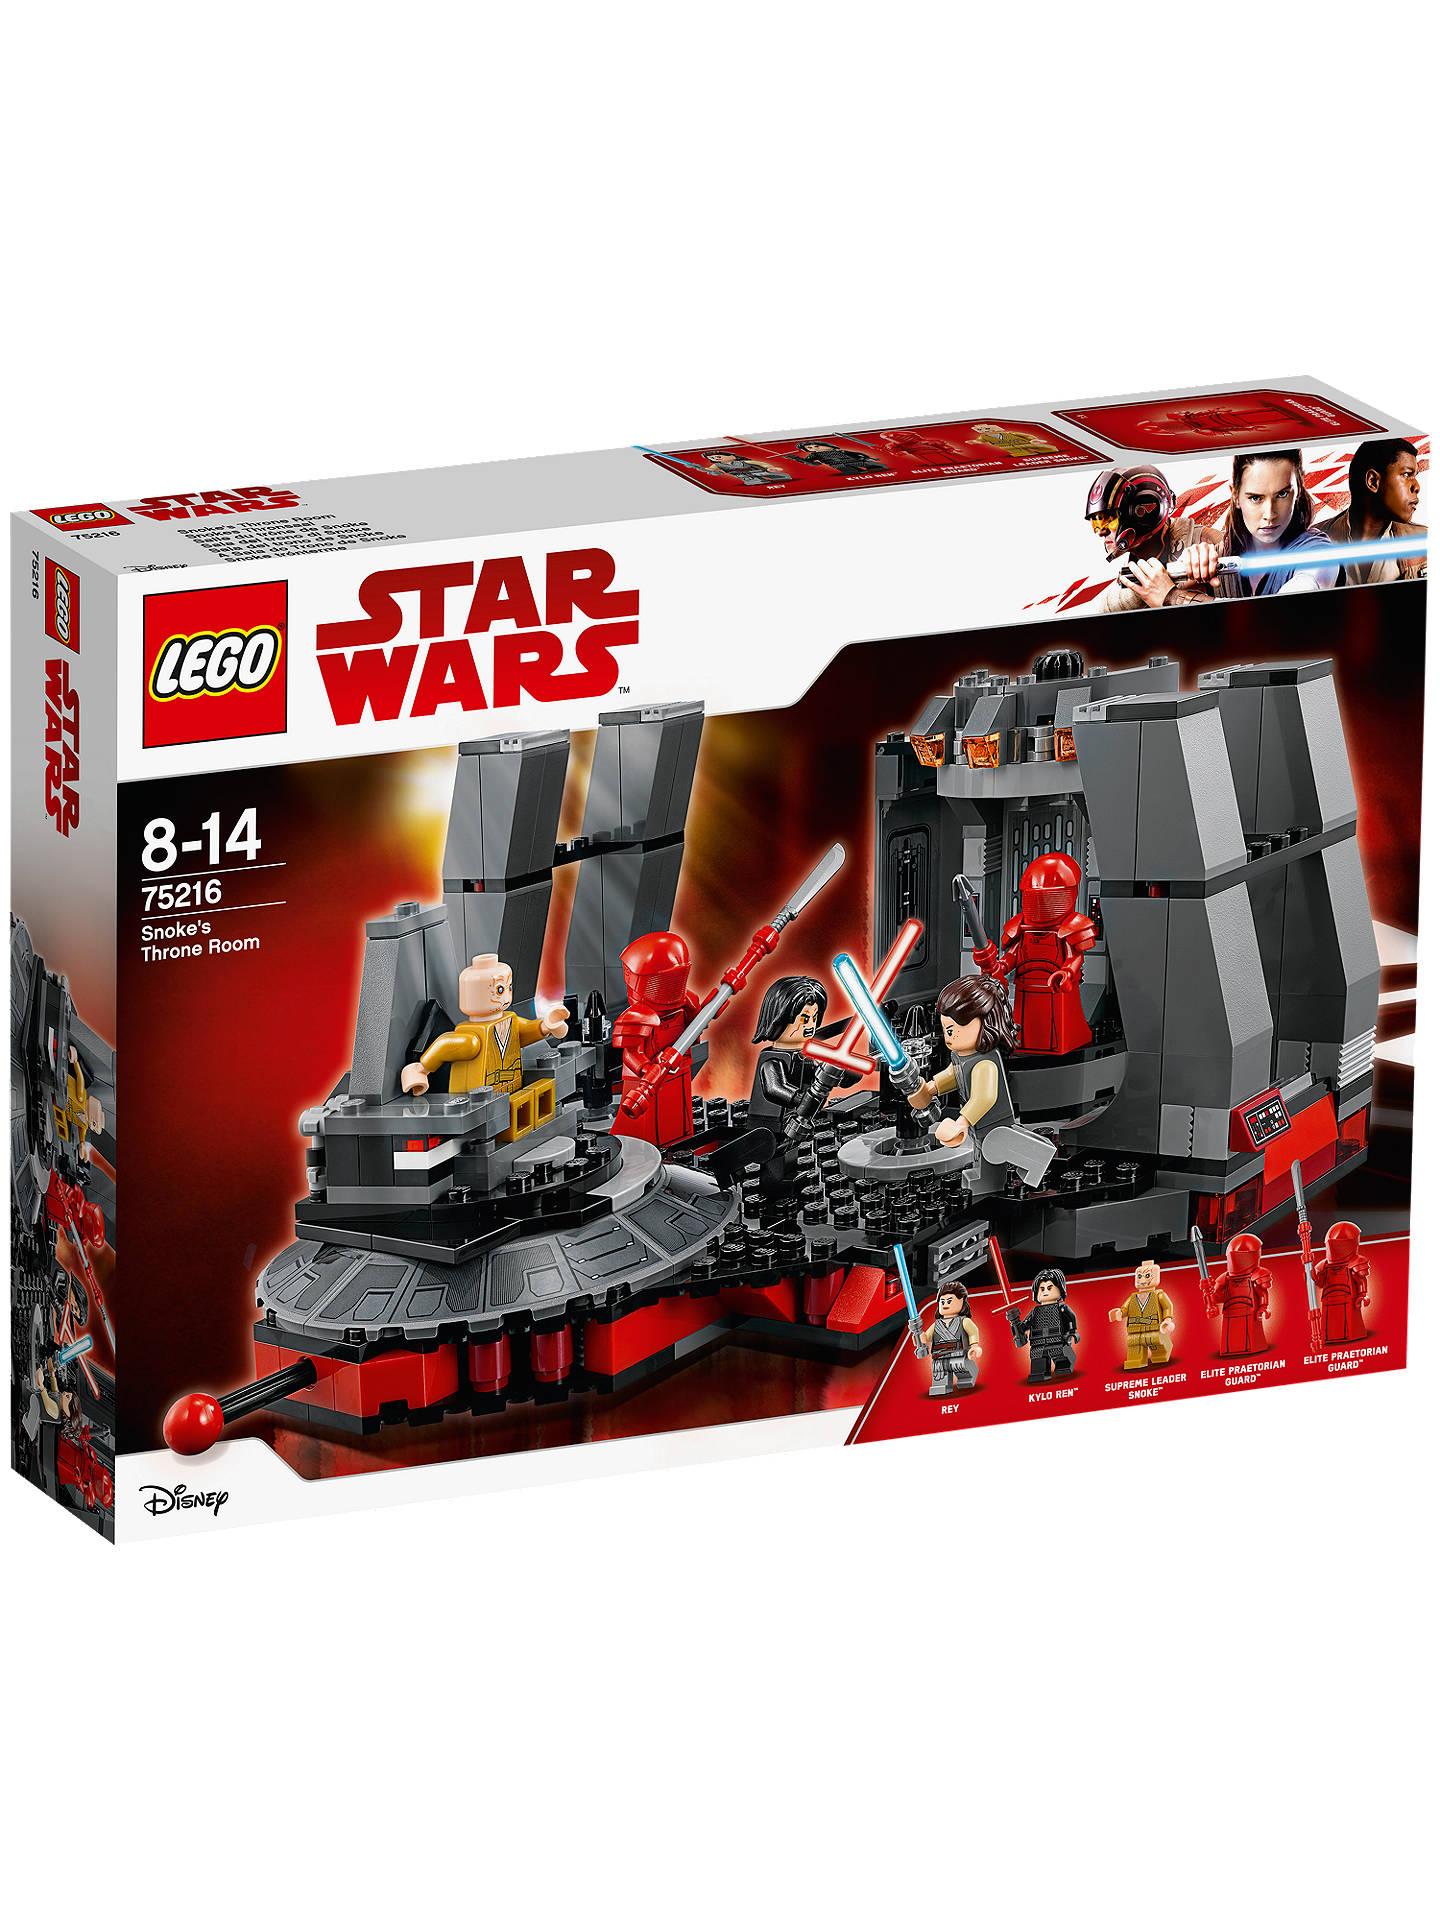 Buy lego star wars 75216 snokes throne room online at johnlewis